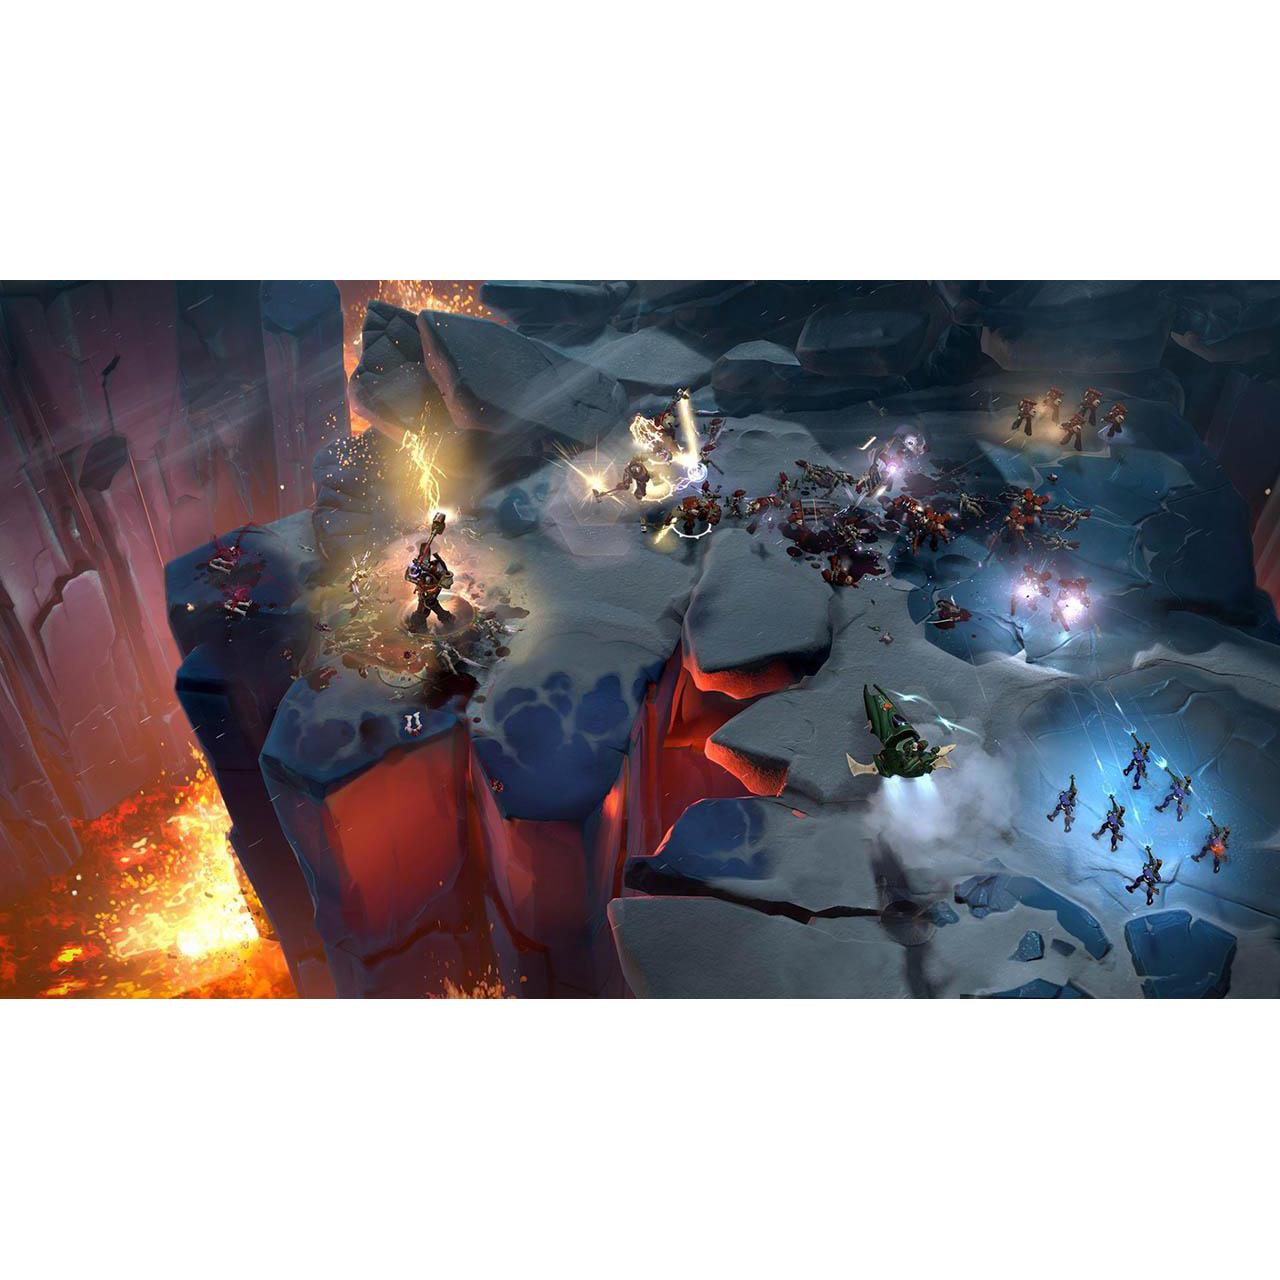 Joc Dawn of War 3 pentru PC 6